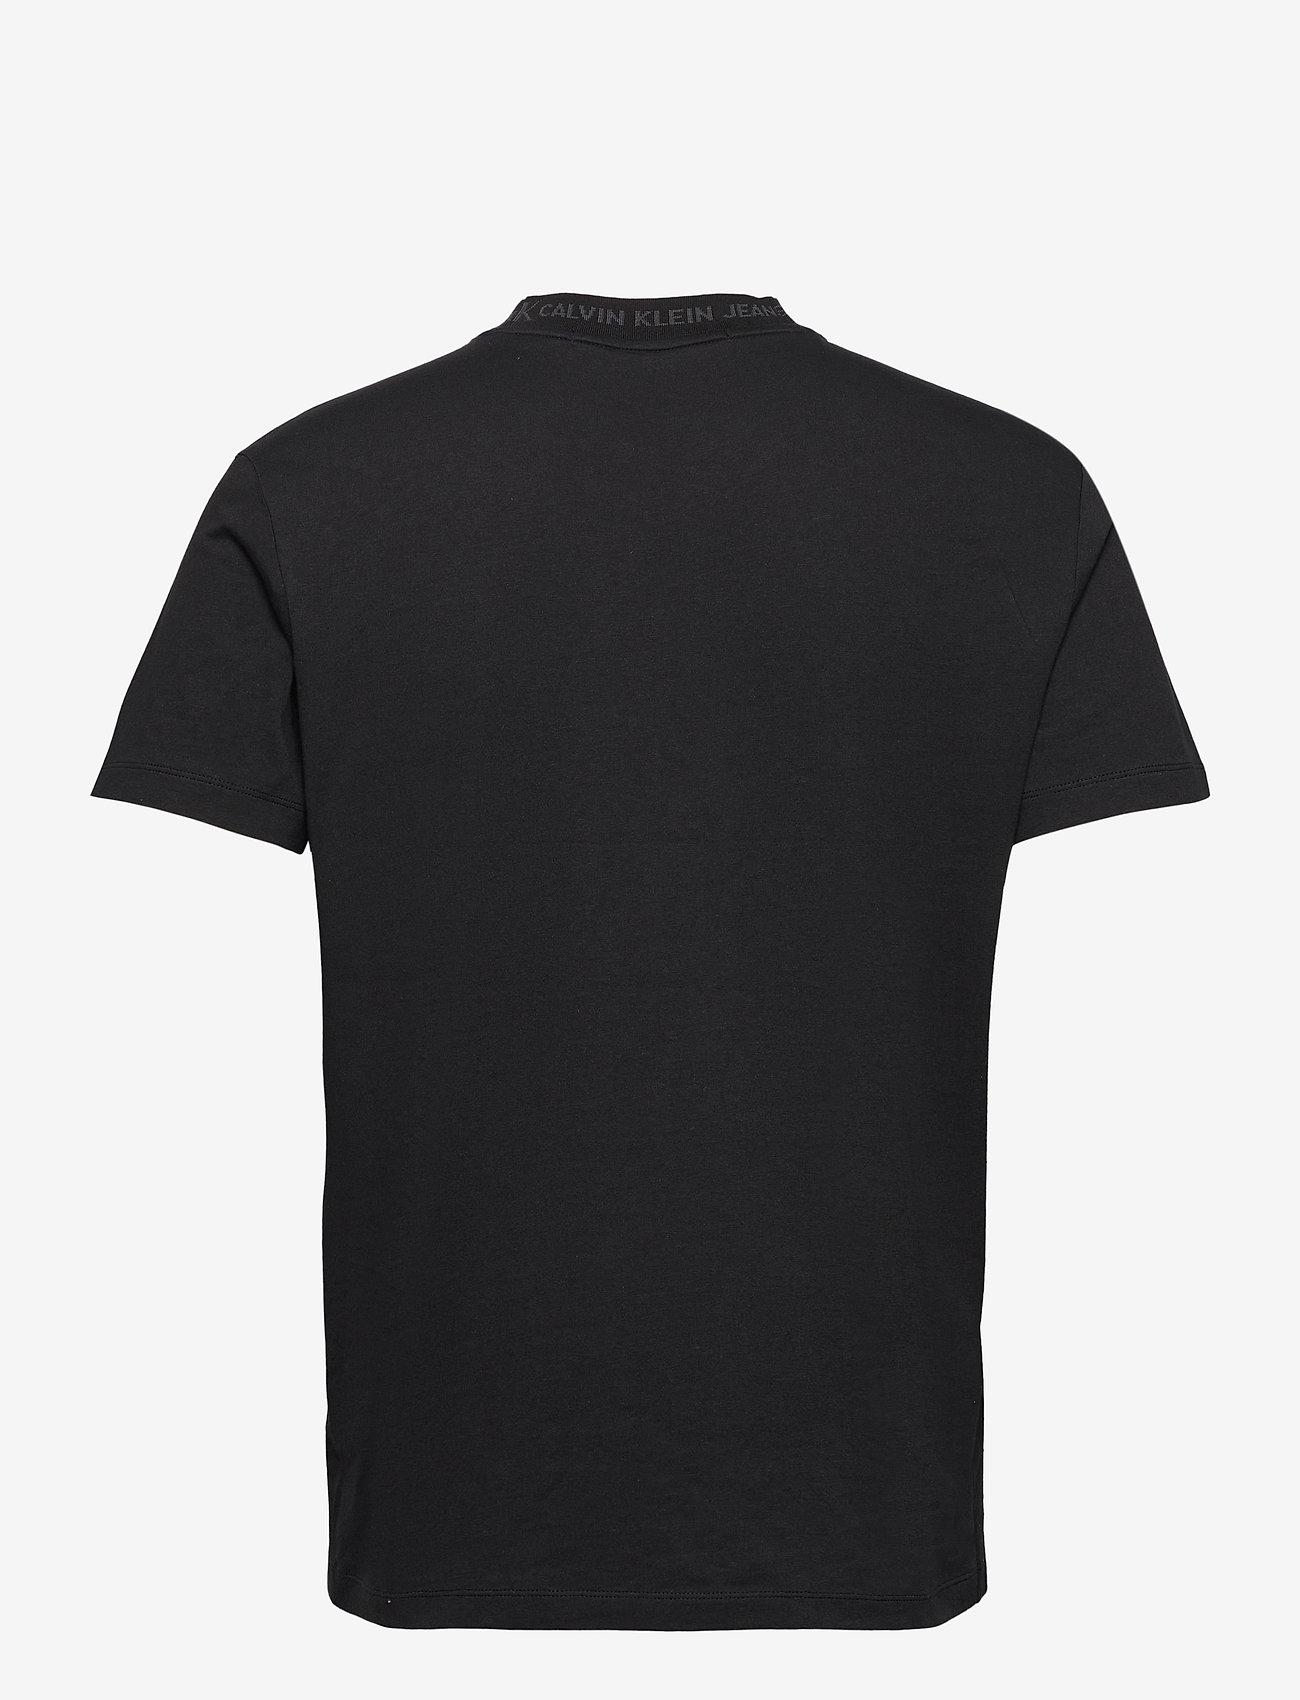 Calvin Klein Jeans - LOGO JACQUARD TEE - t-shirts basiques - ck black - 1